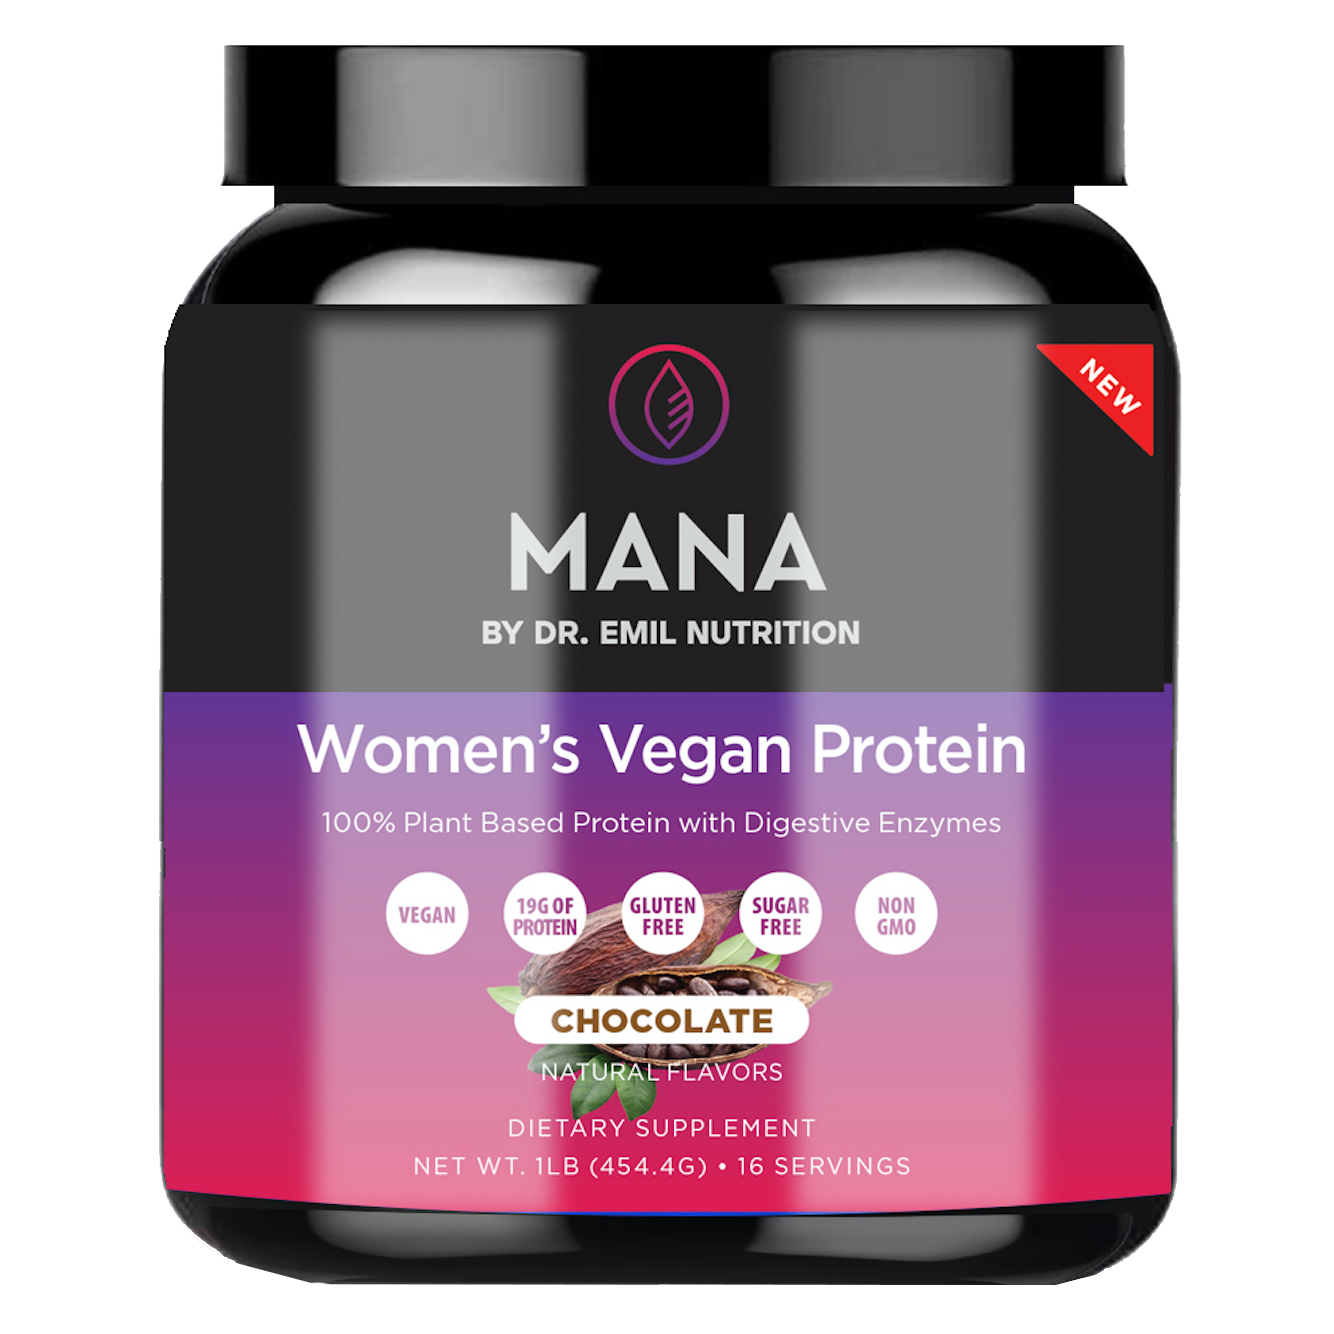 MANA Vegan Protein